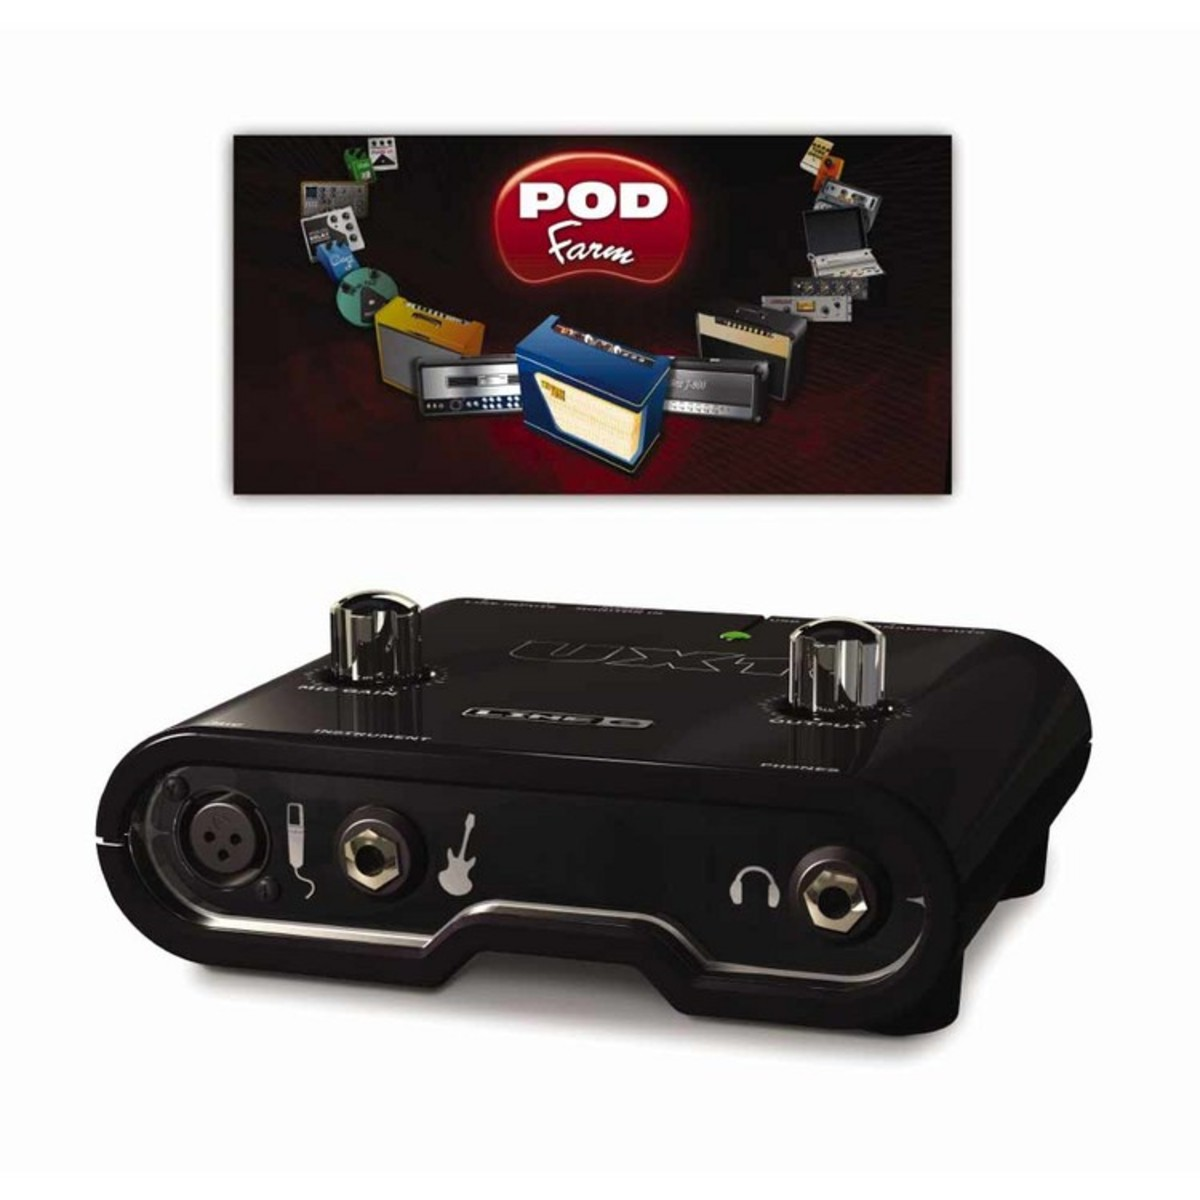 line 6 pod studio ux1 usb audio interface at gear4music. Black Bedroom Furniture Sets. Home Design Ideas